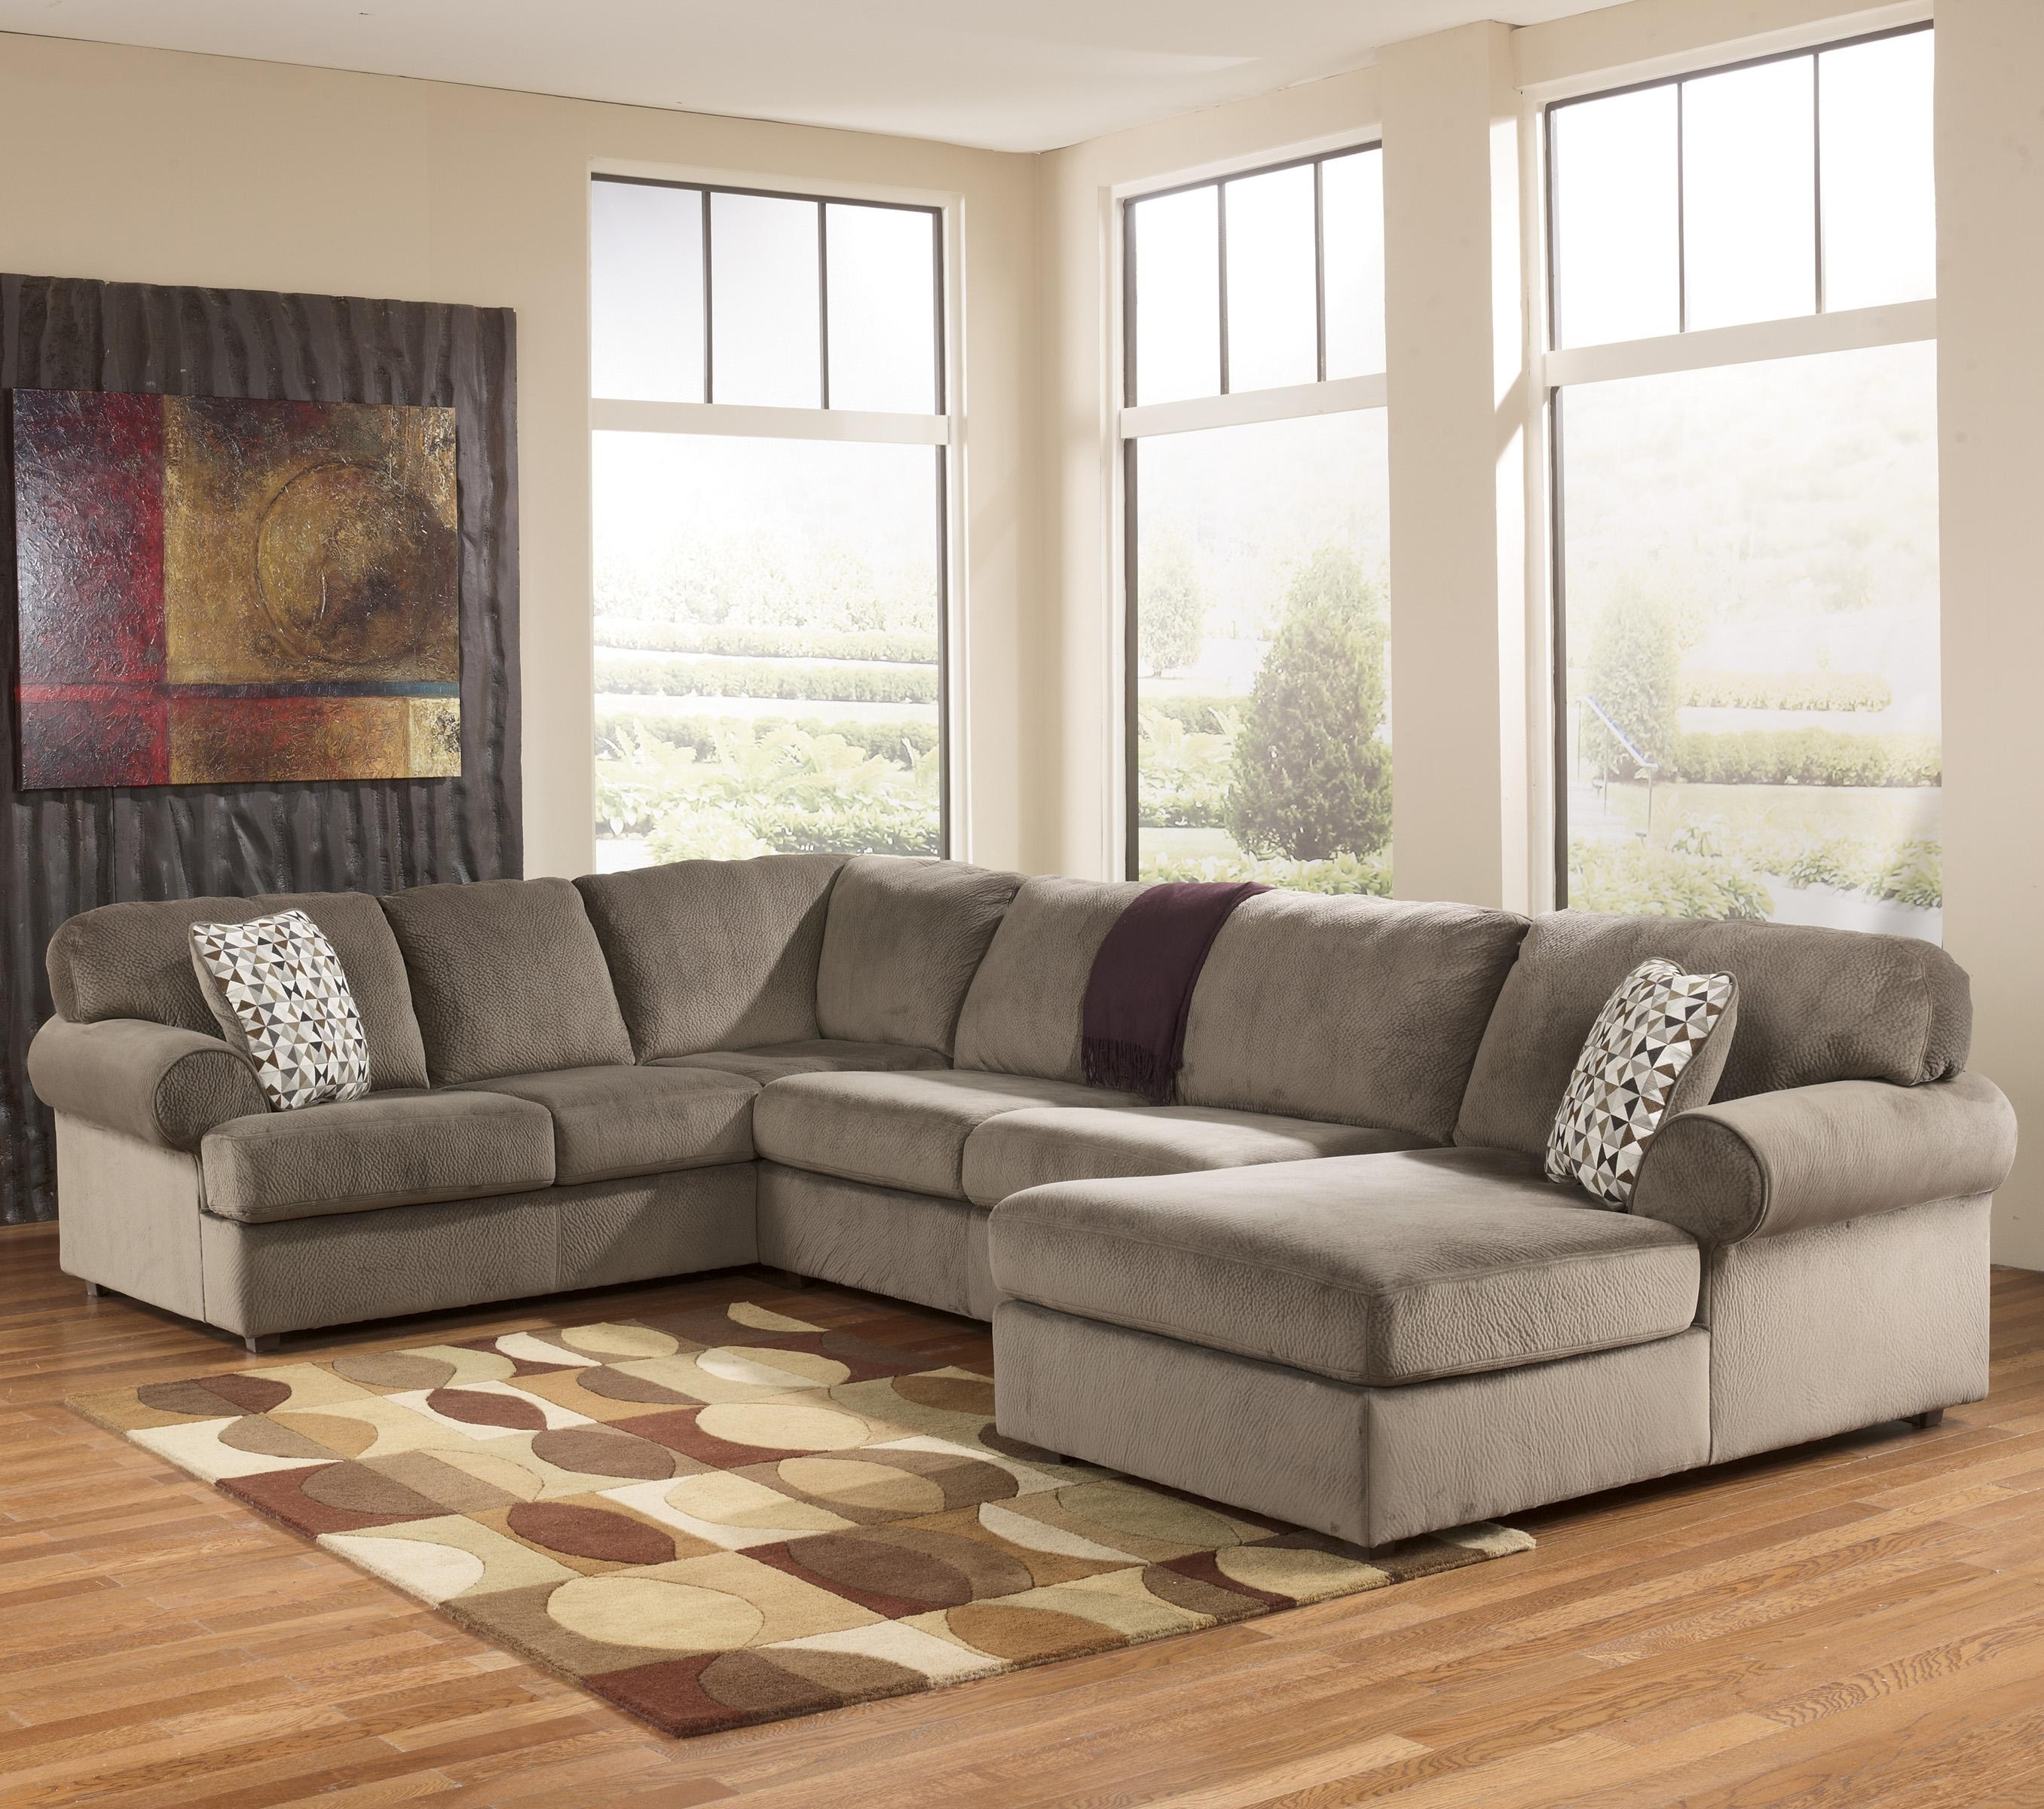 Signature Designashley Jessa Place - Dune Casual Sectional Sofa regarding Erie Pa Sectional Sofas (Image 10 of 10)